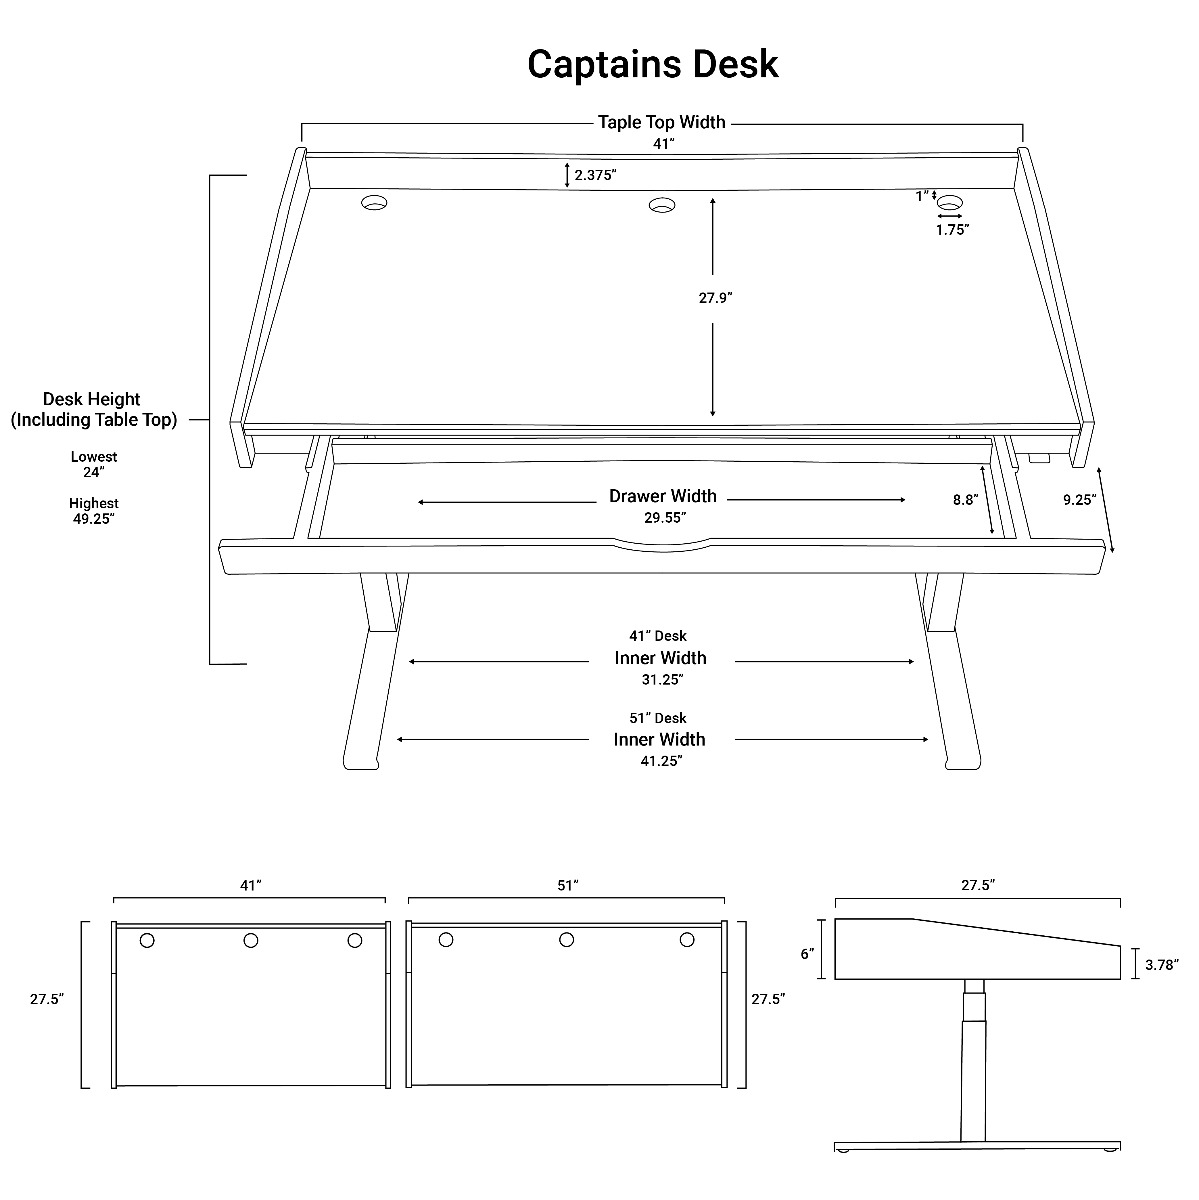 CaptainsDesk_LineDrawing_Web_2_